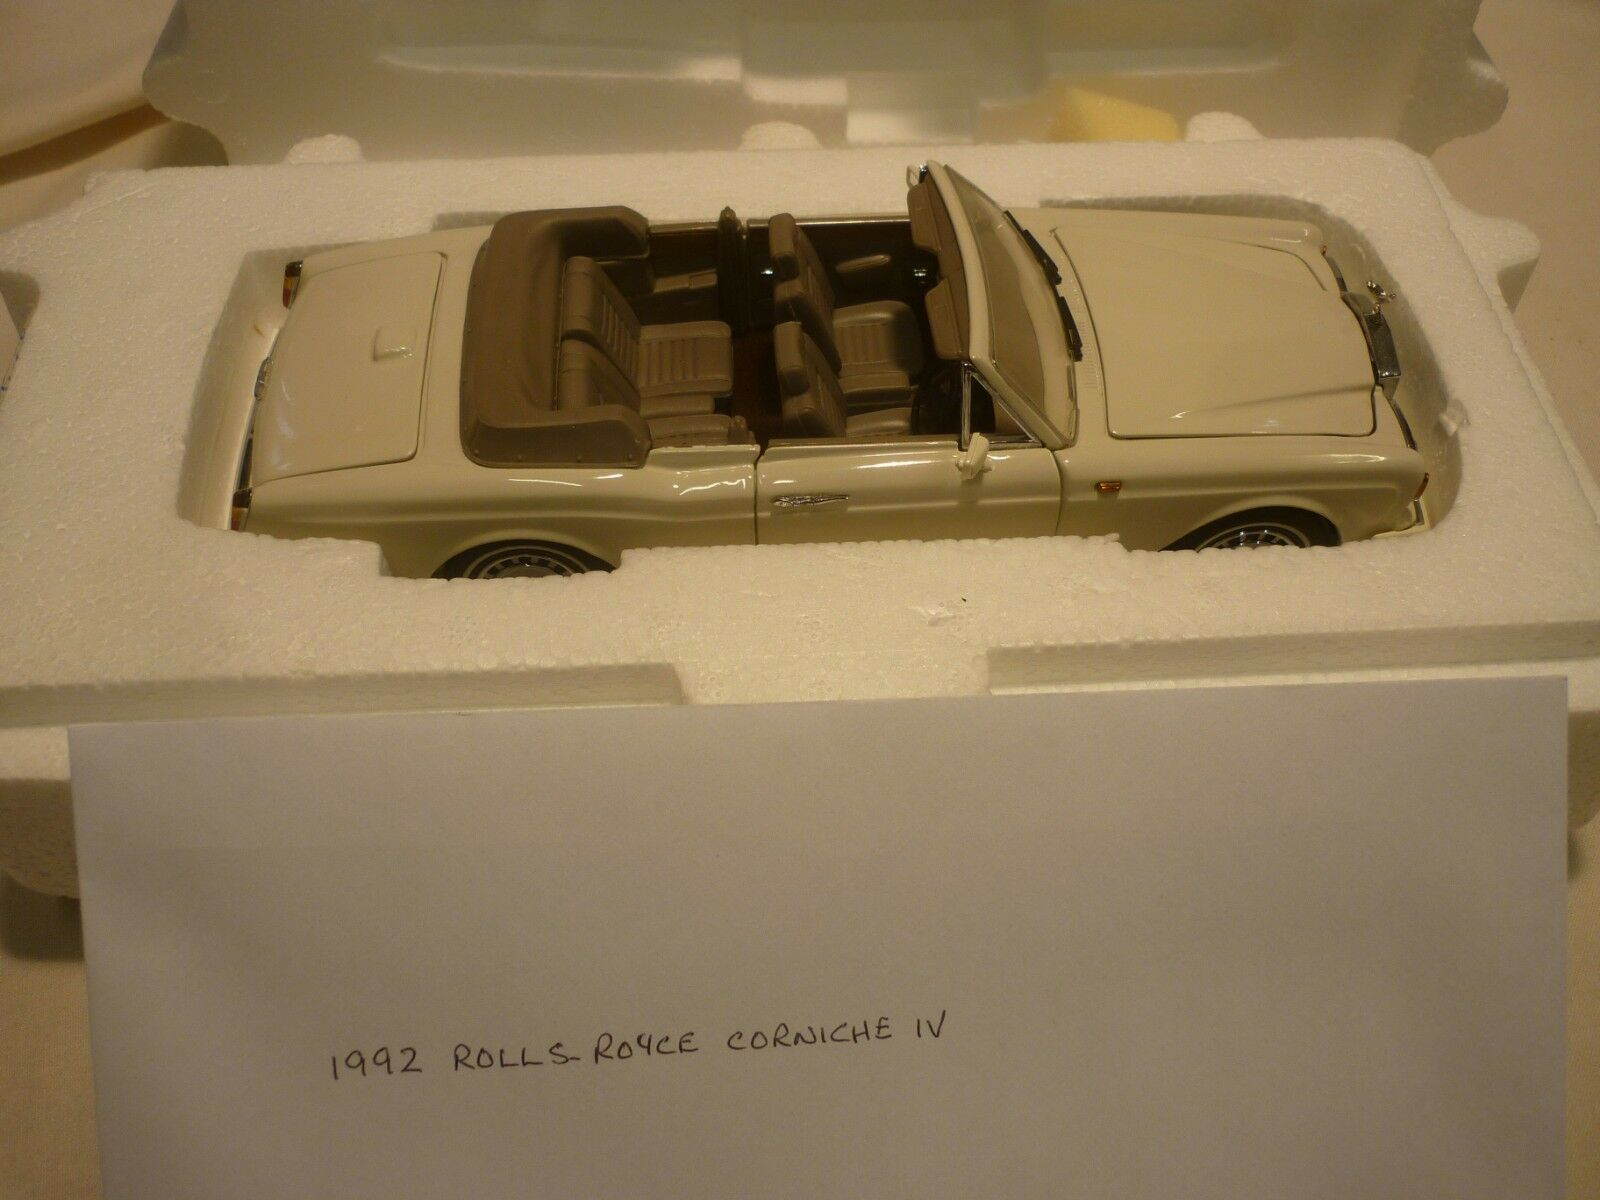 Un Franklin Comme neuf scale model of a 1992 ROLLS ROYCE Corniche IV. Boxed, papiers